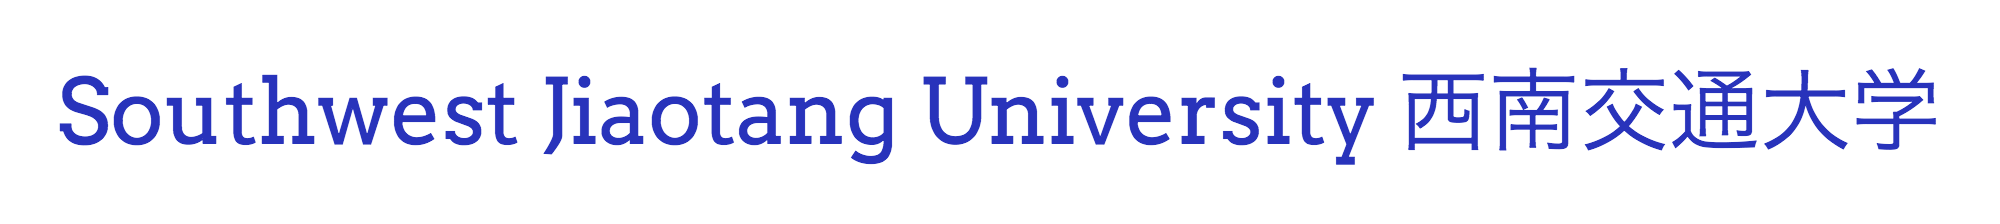 Southwest Jiaotang University 西南交通大学-logo(1).png